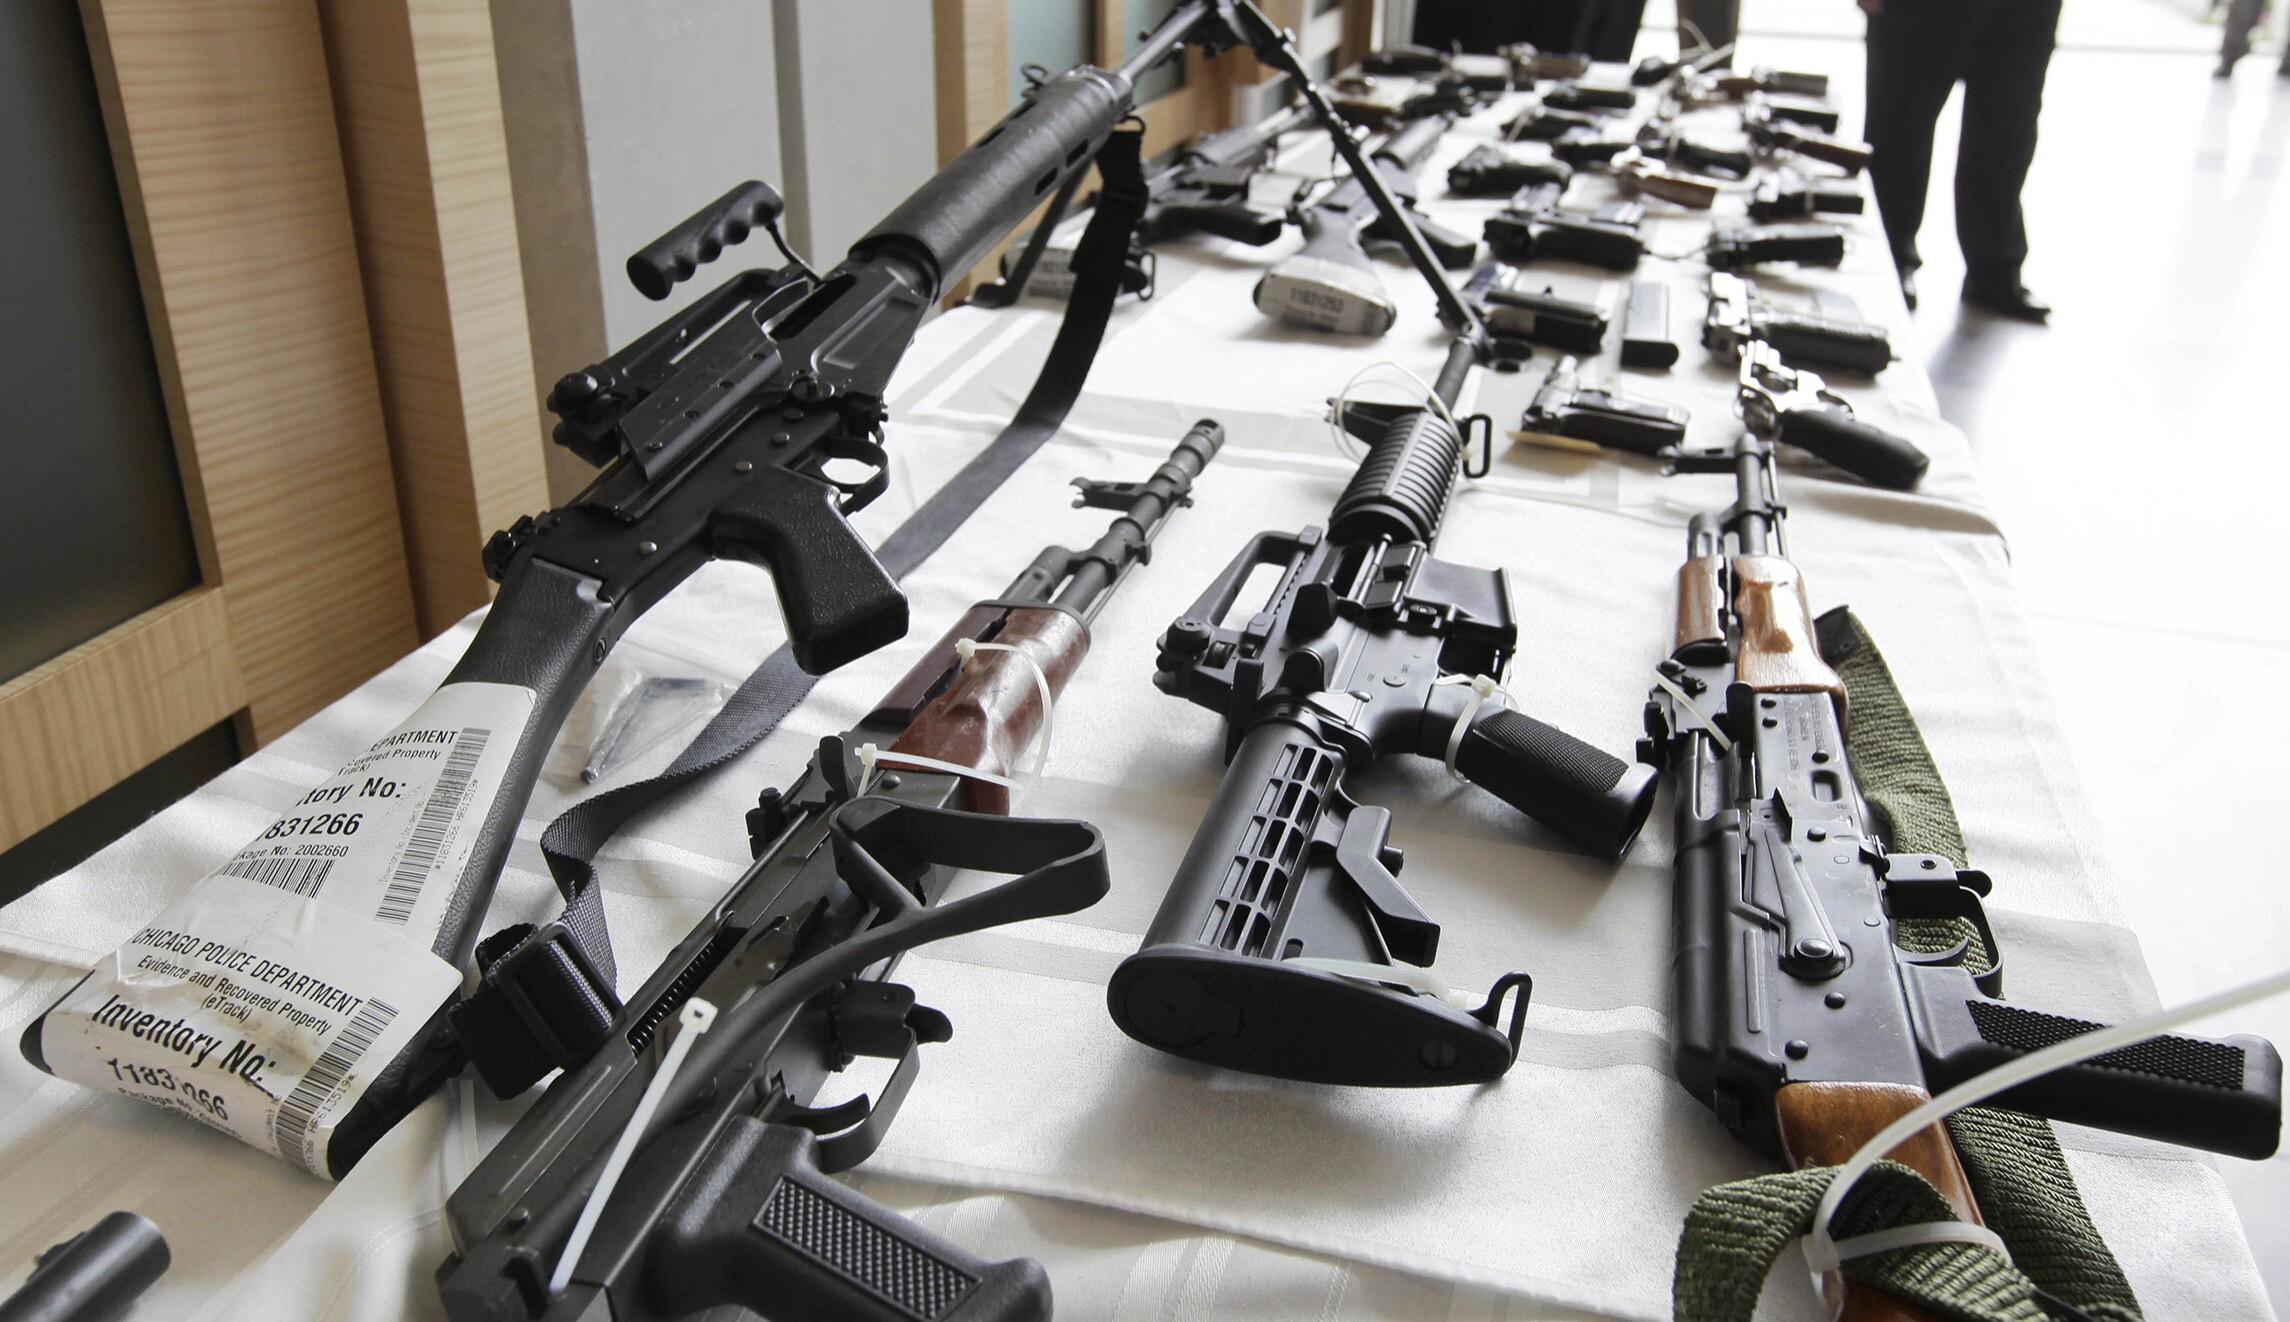 House Democrats introduce bill prohibiting sale of semi-automatic